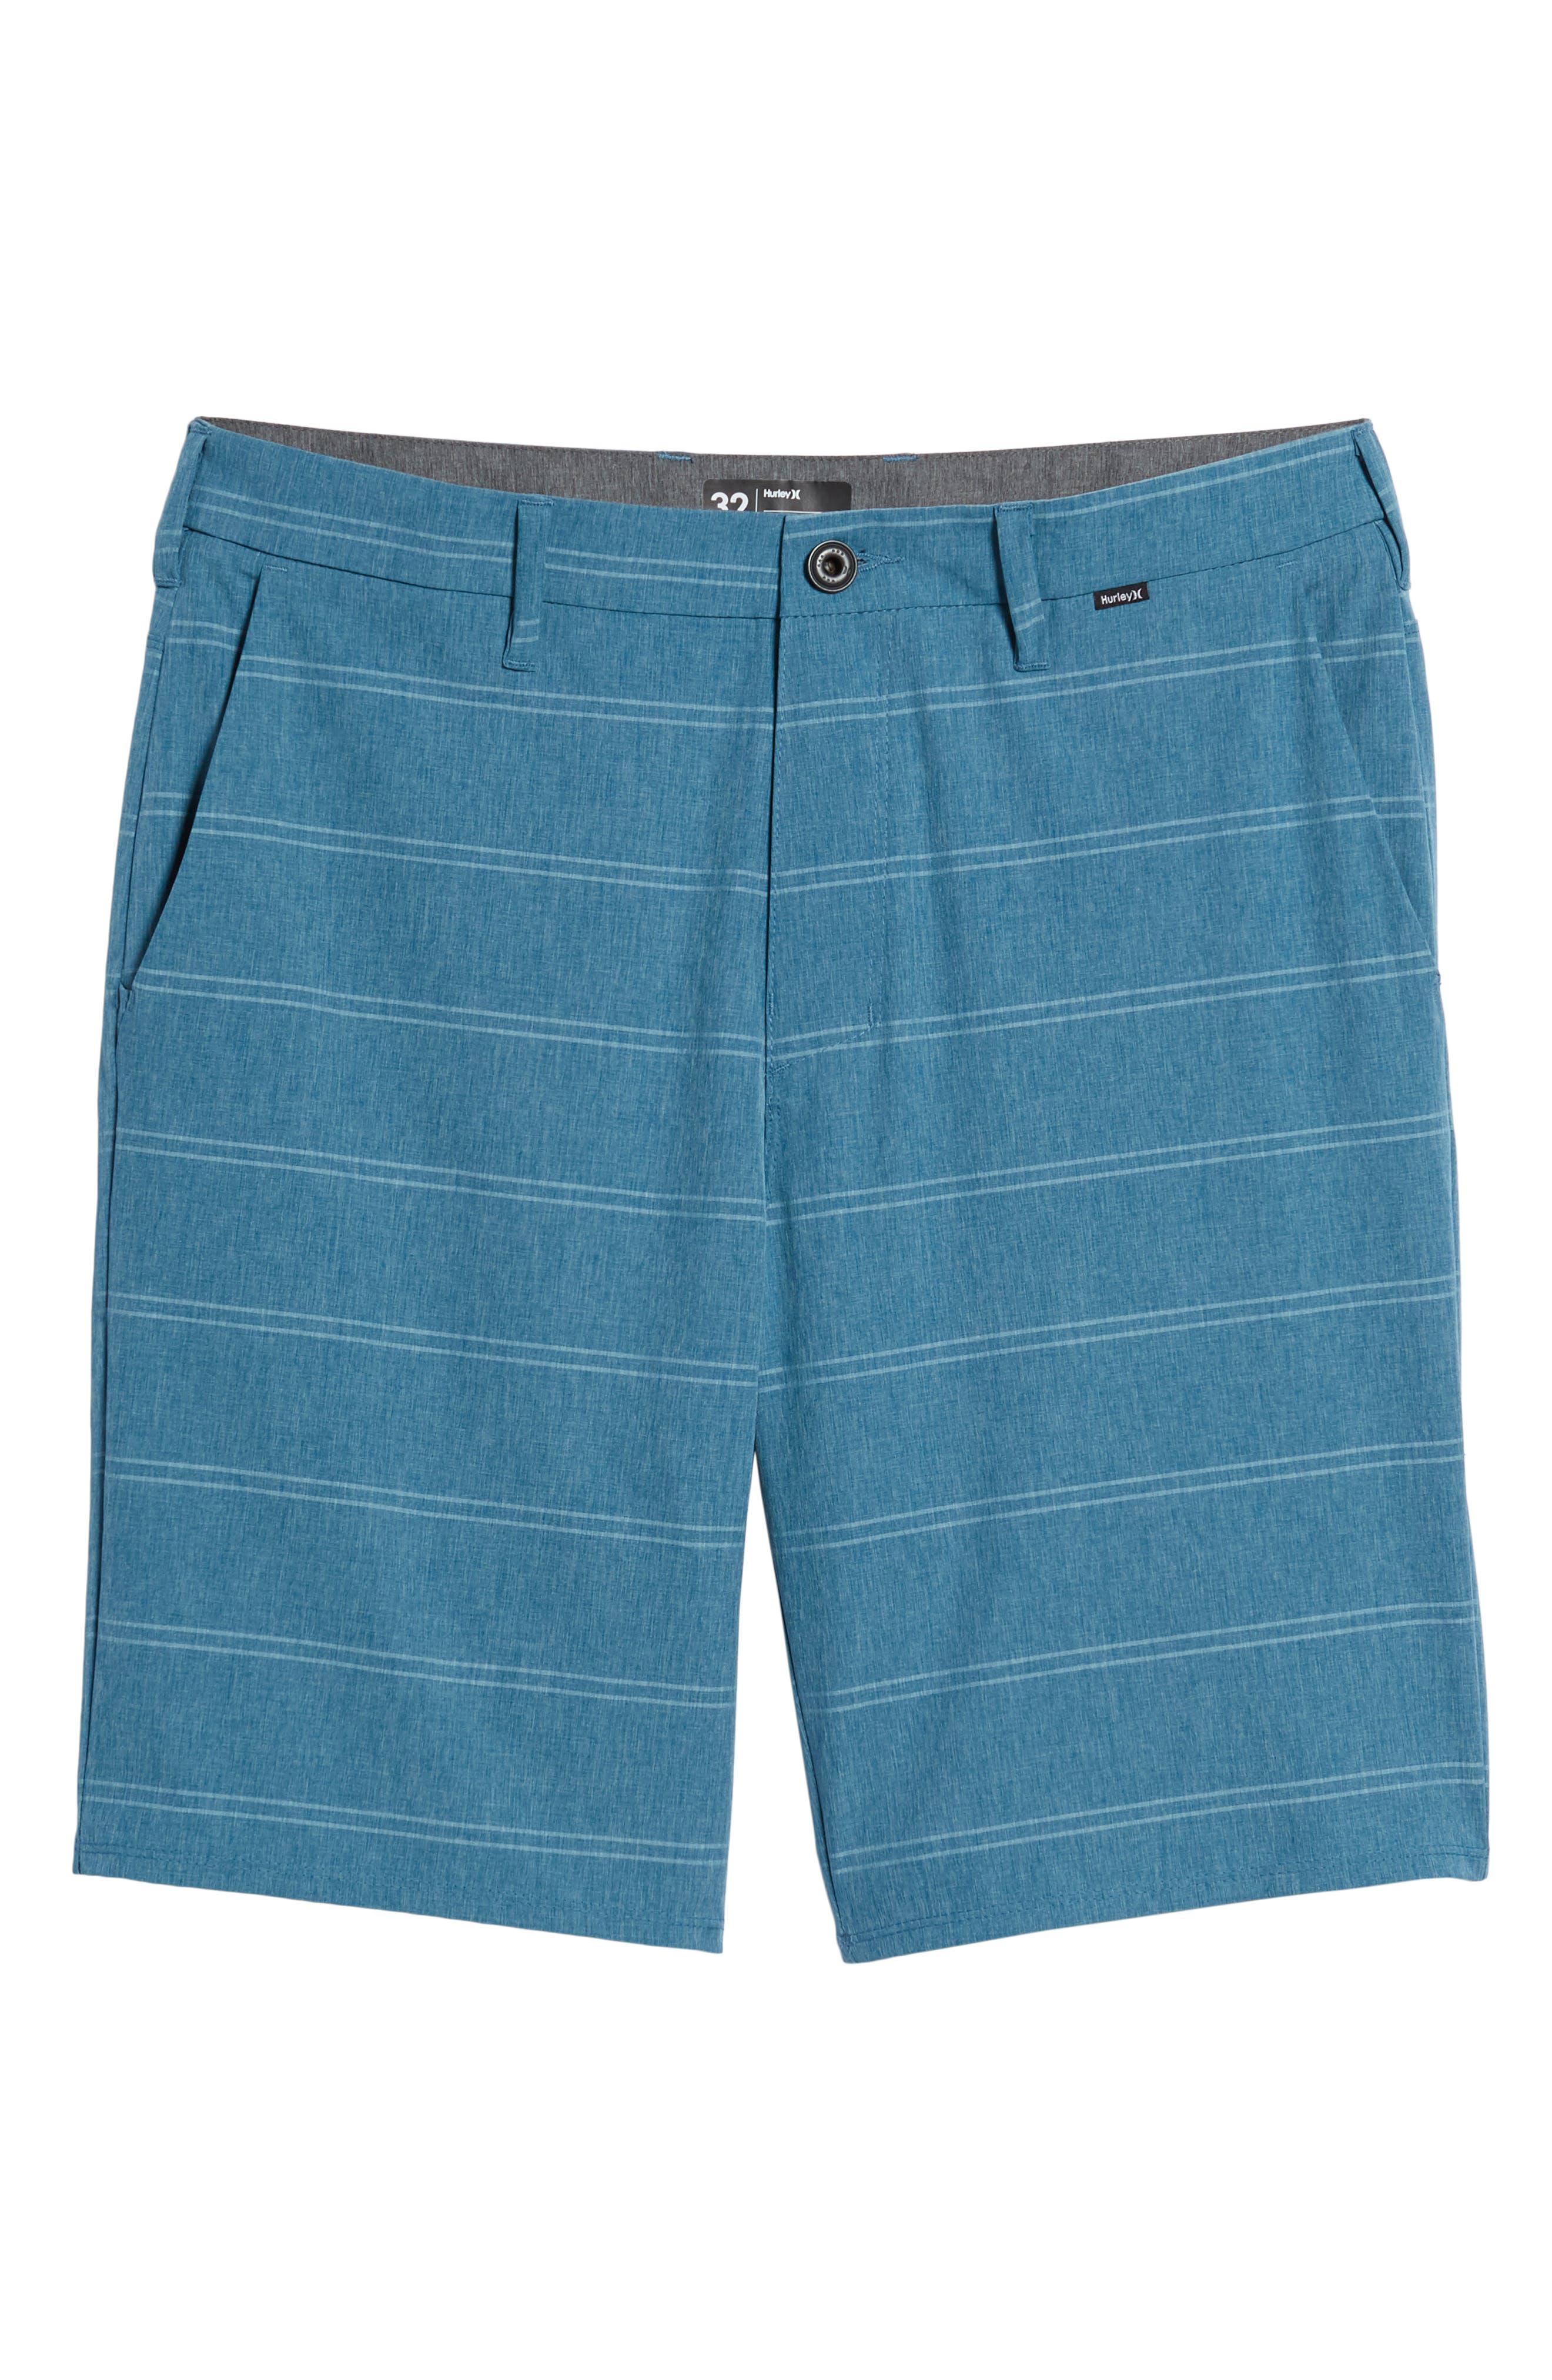 Phantom Hybrid Shorts,                             Alternate thumbnail 4, color,                             Space Blue